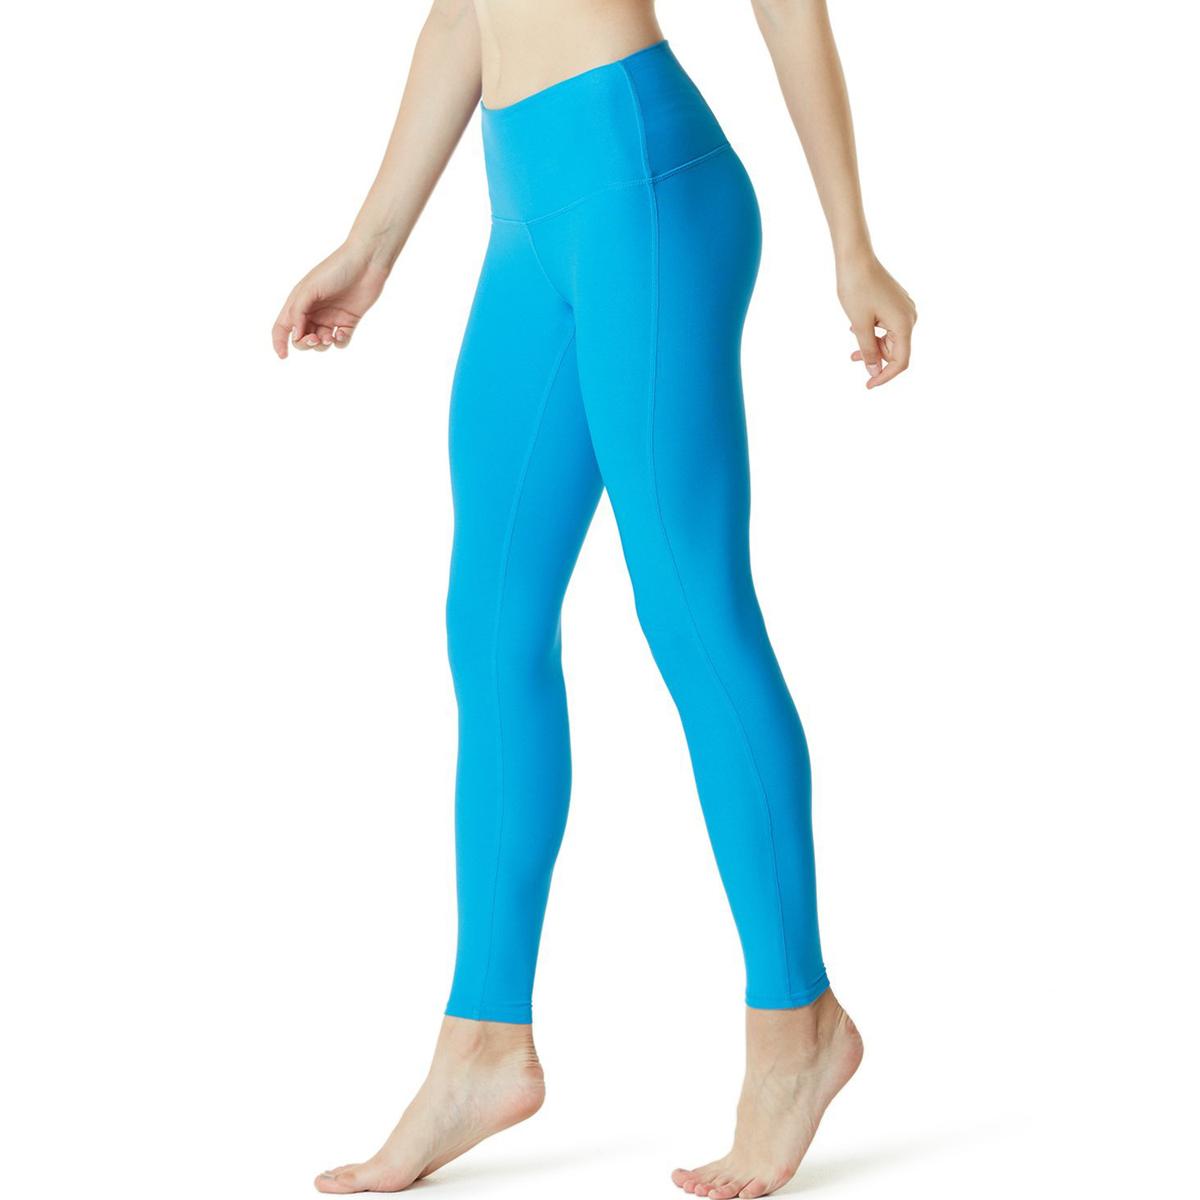 thumbnail 67 - TSLA Tesla FYP42 Women's High-Waisted Ultra-Stretch Tummy Control Yoga Pants